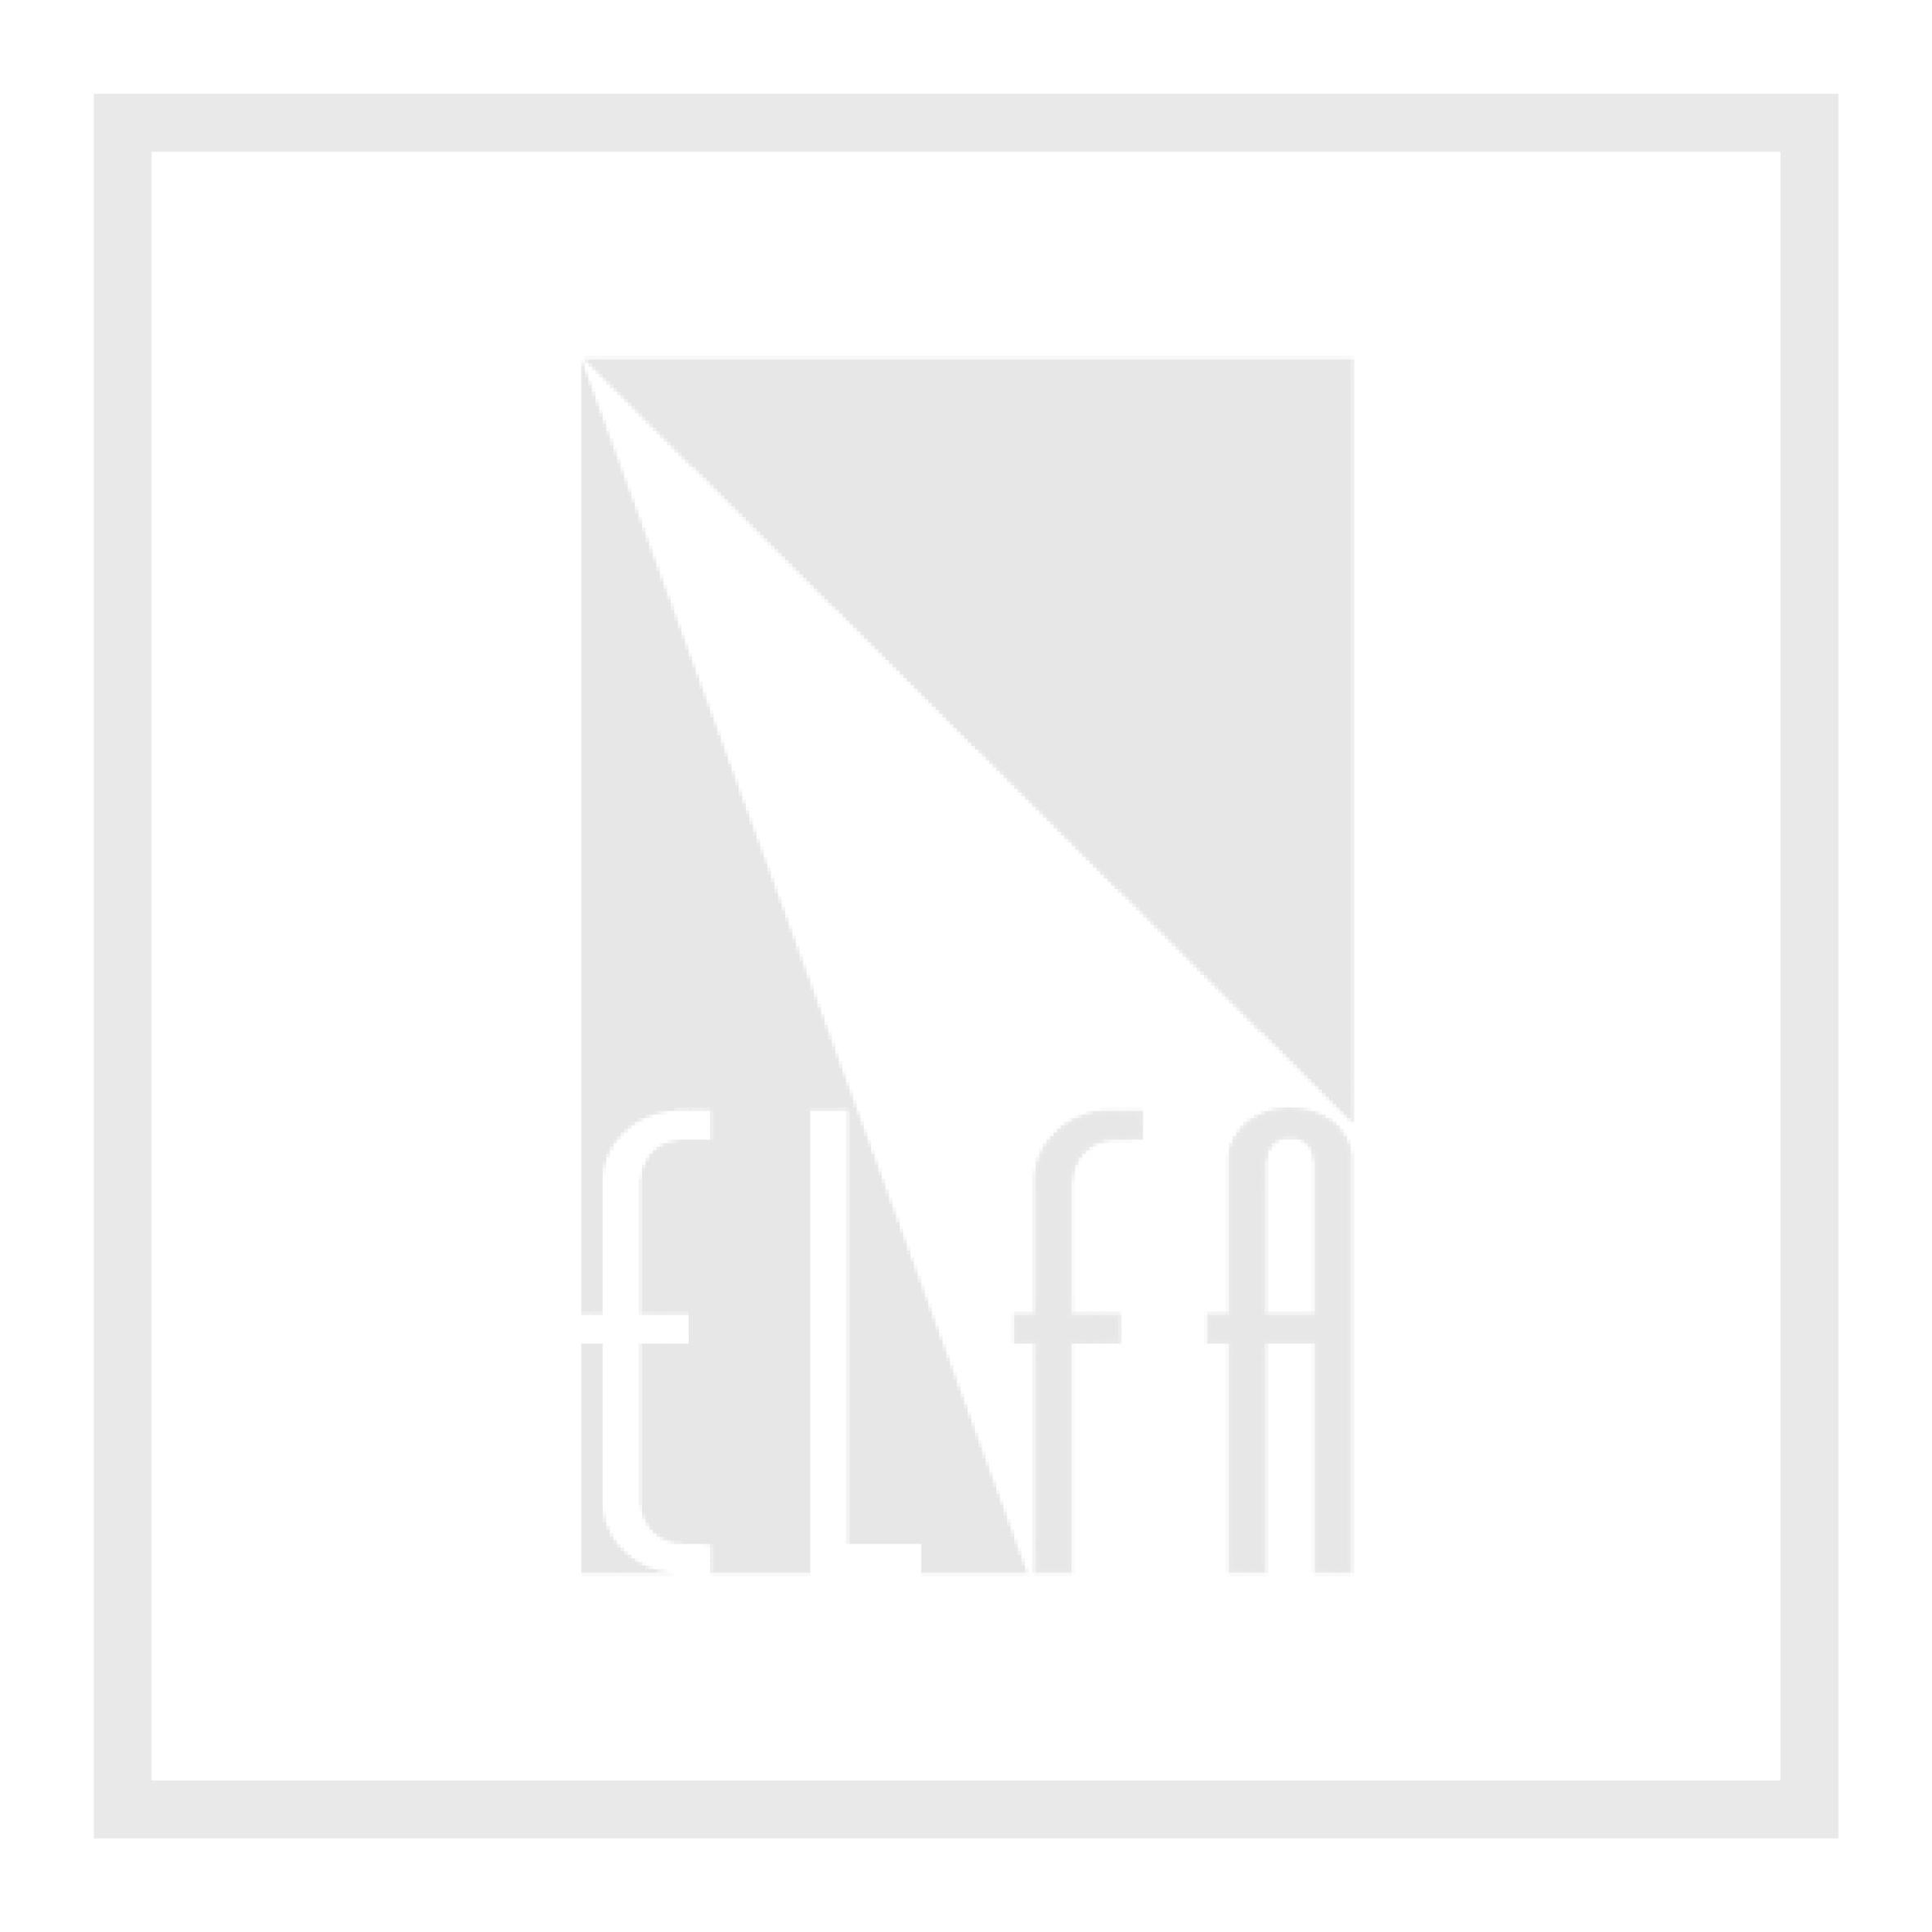 Varta LR1 N LADY 1,5V high energy 880mAh Alkaline batt